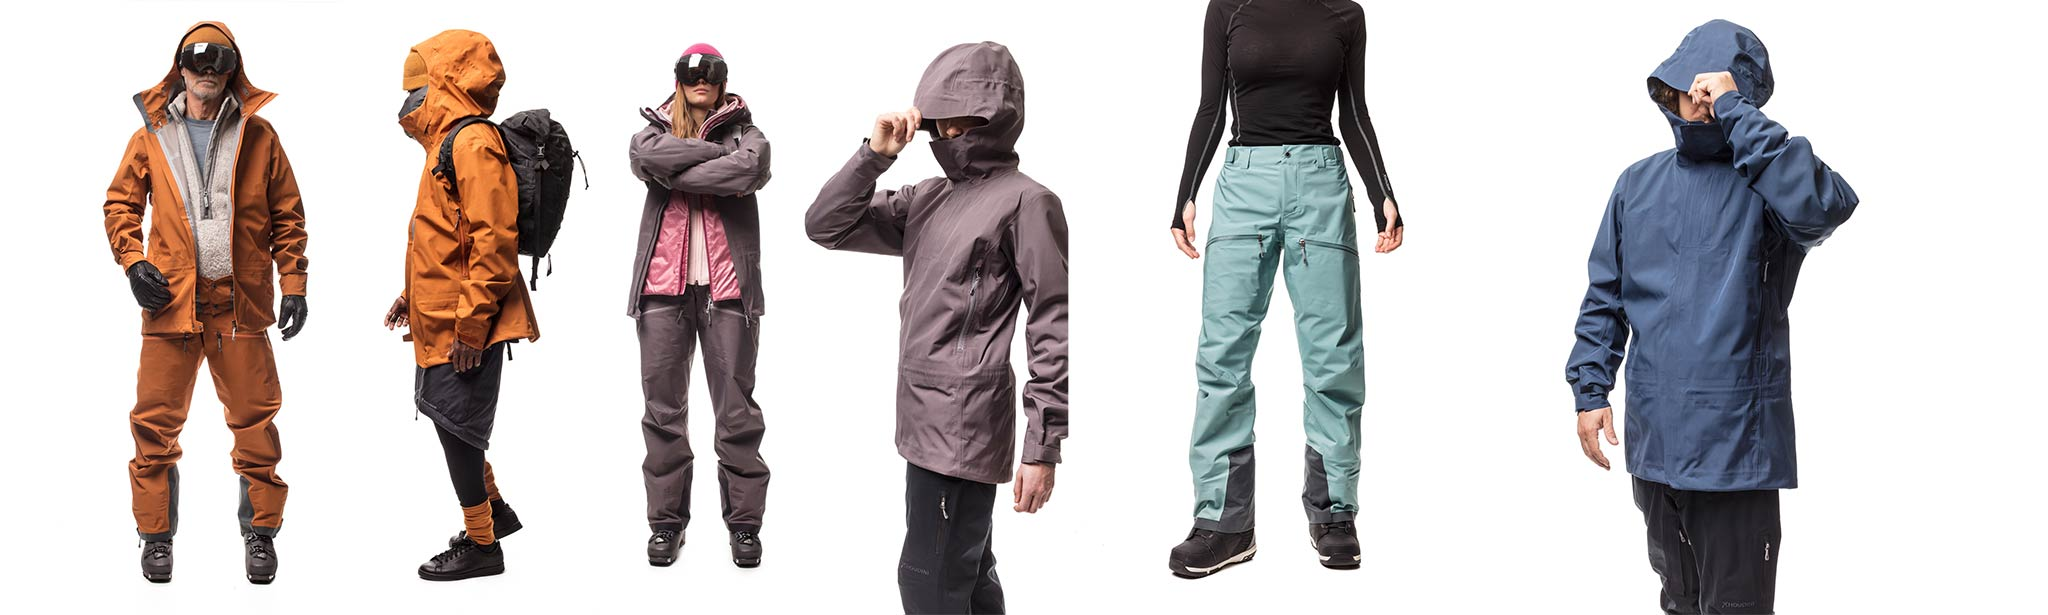 Die neue Houdini D Jacket und Purpose Pants in verschiedenen Style - Foto: Houdini